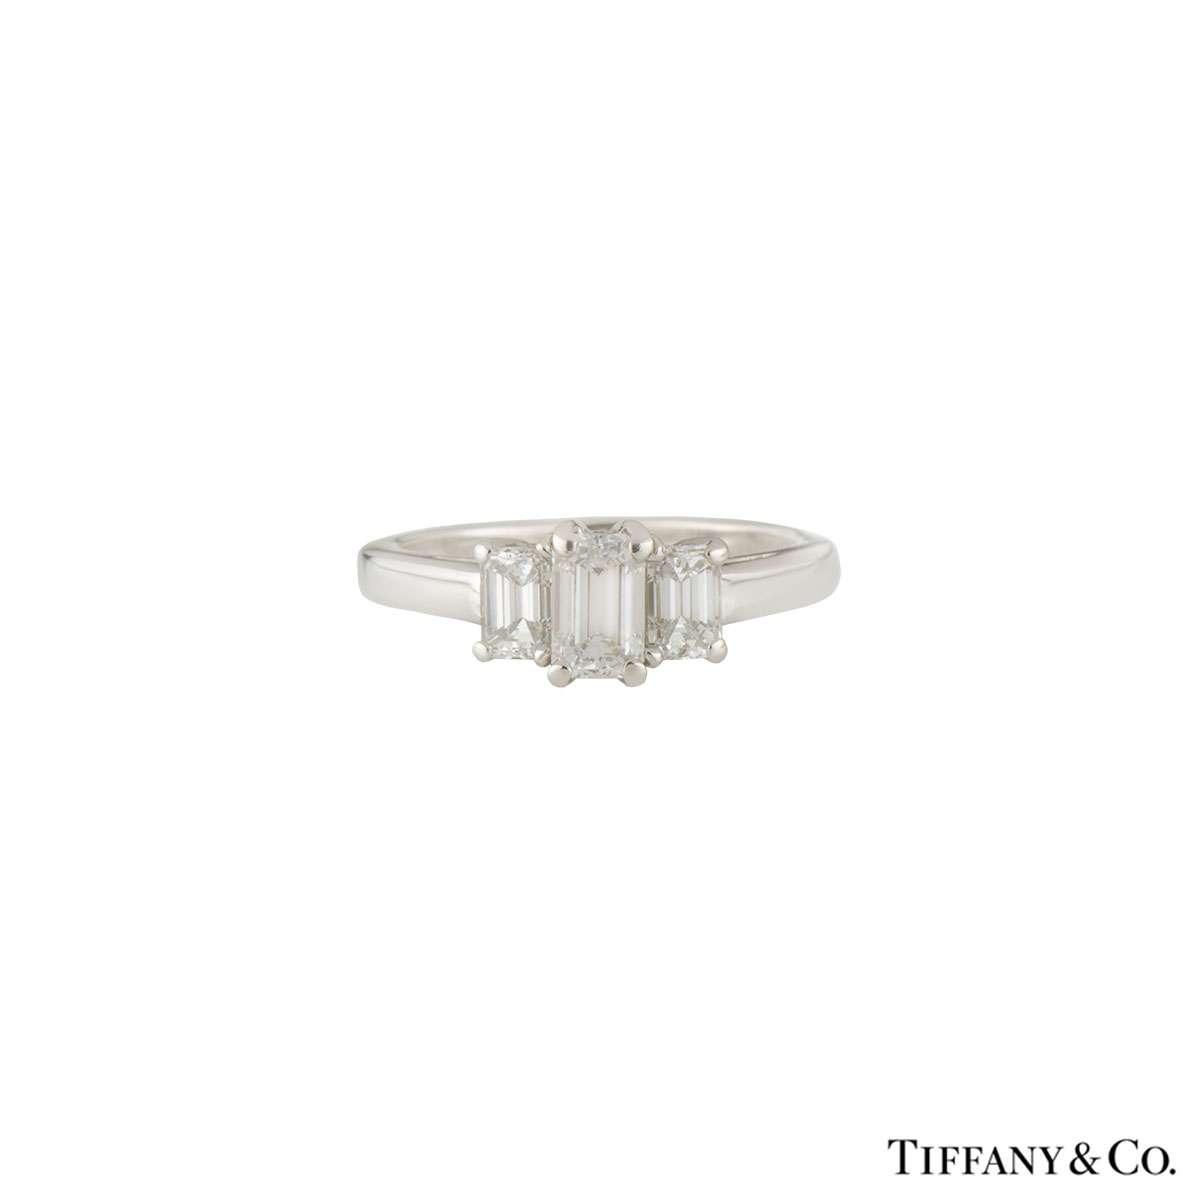 Tiffany Co Platinum Lucida 2mm Wedding Band Ring Sz 8: Tiffany & Co. Trilogy Ring